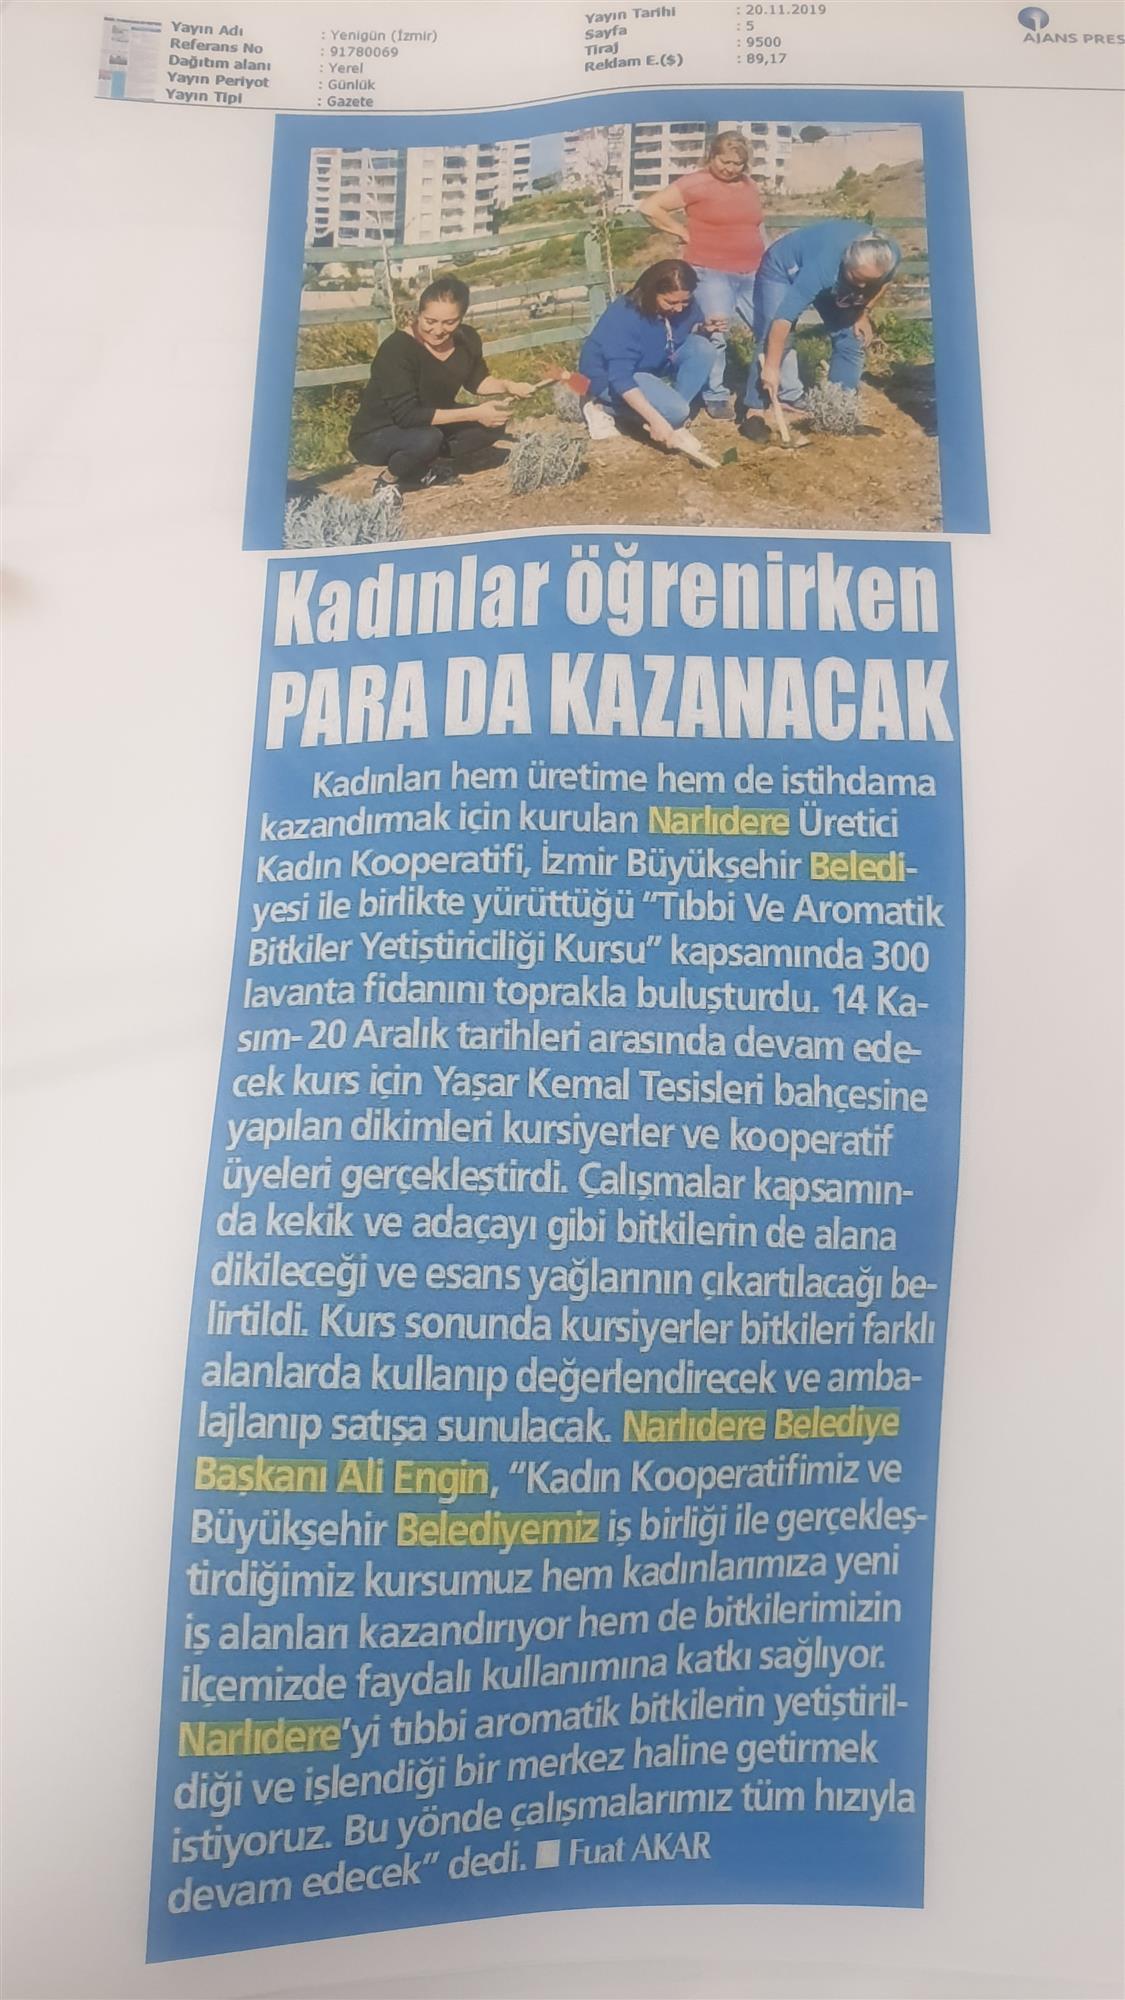 gazete-haberleri20201281672778